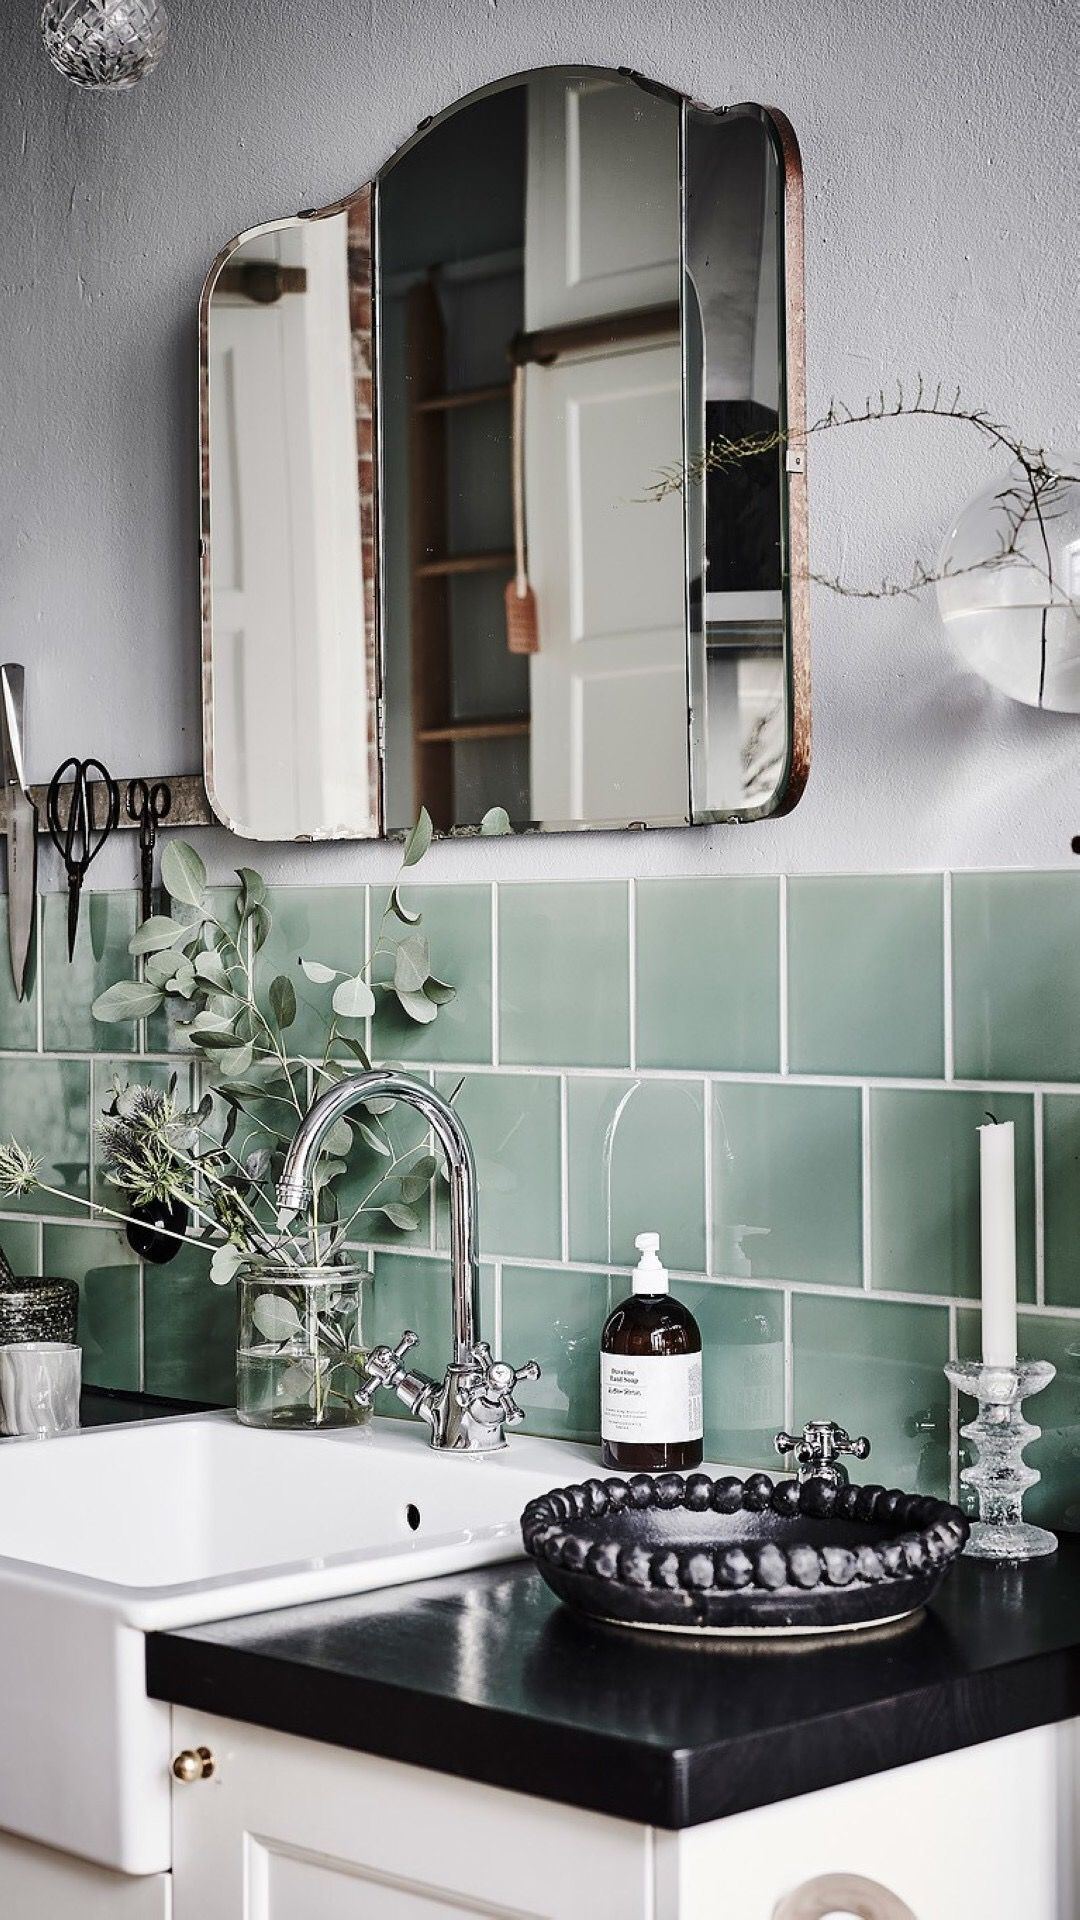 Idea De Laura En H O U S E Cocina Atemporal Interiores De Casa